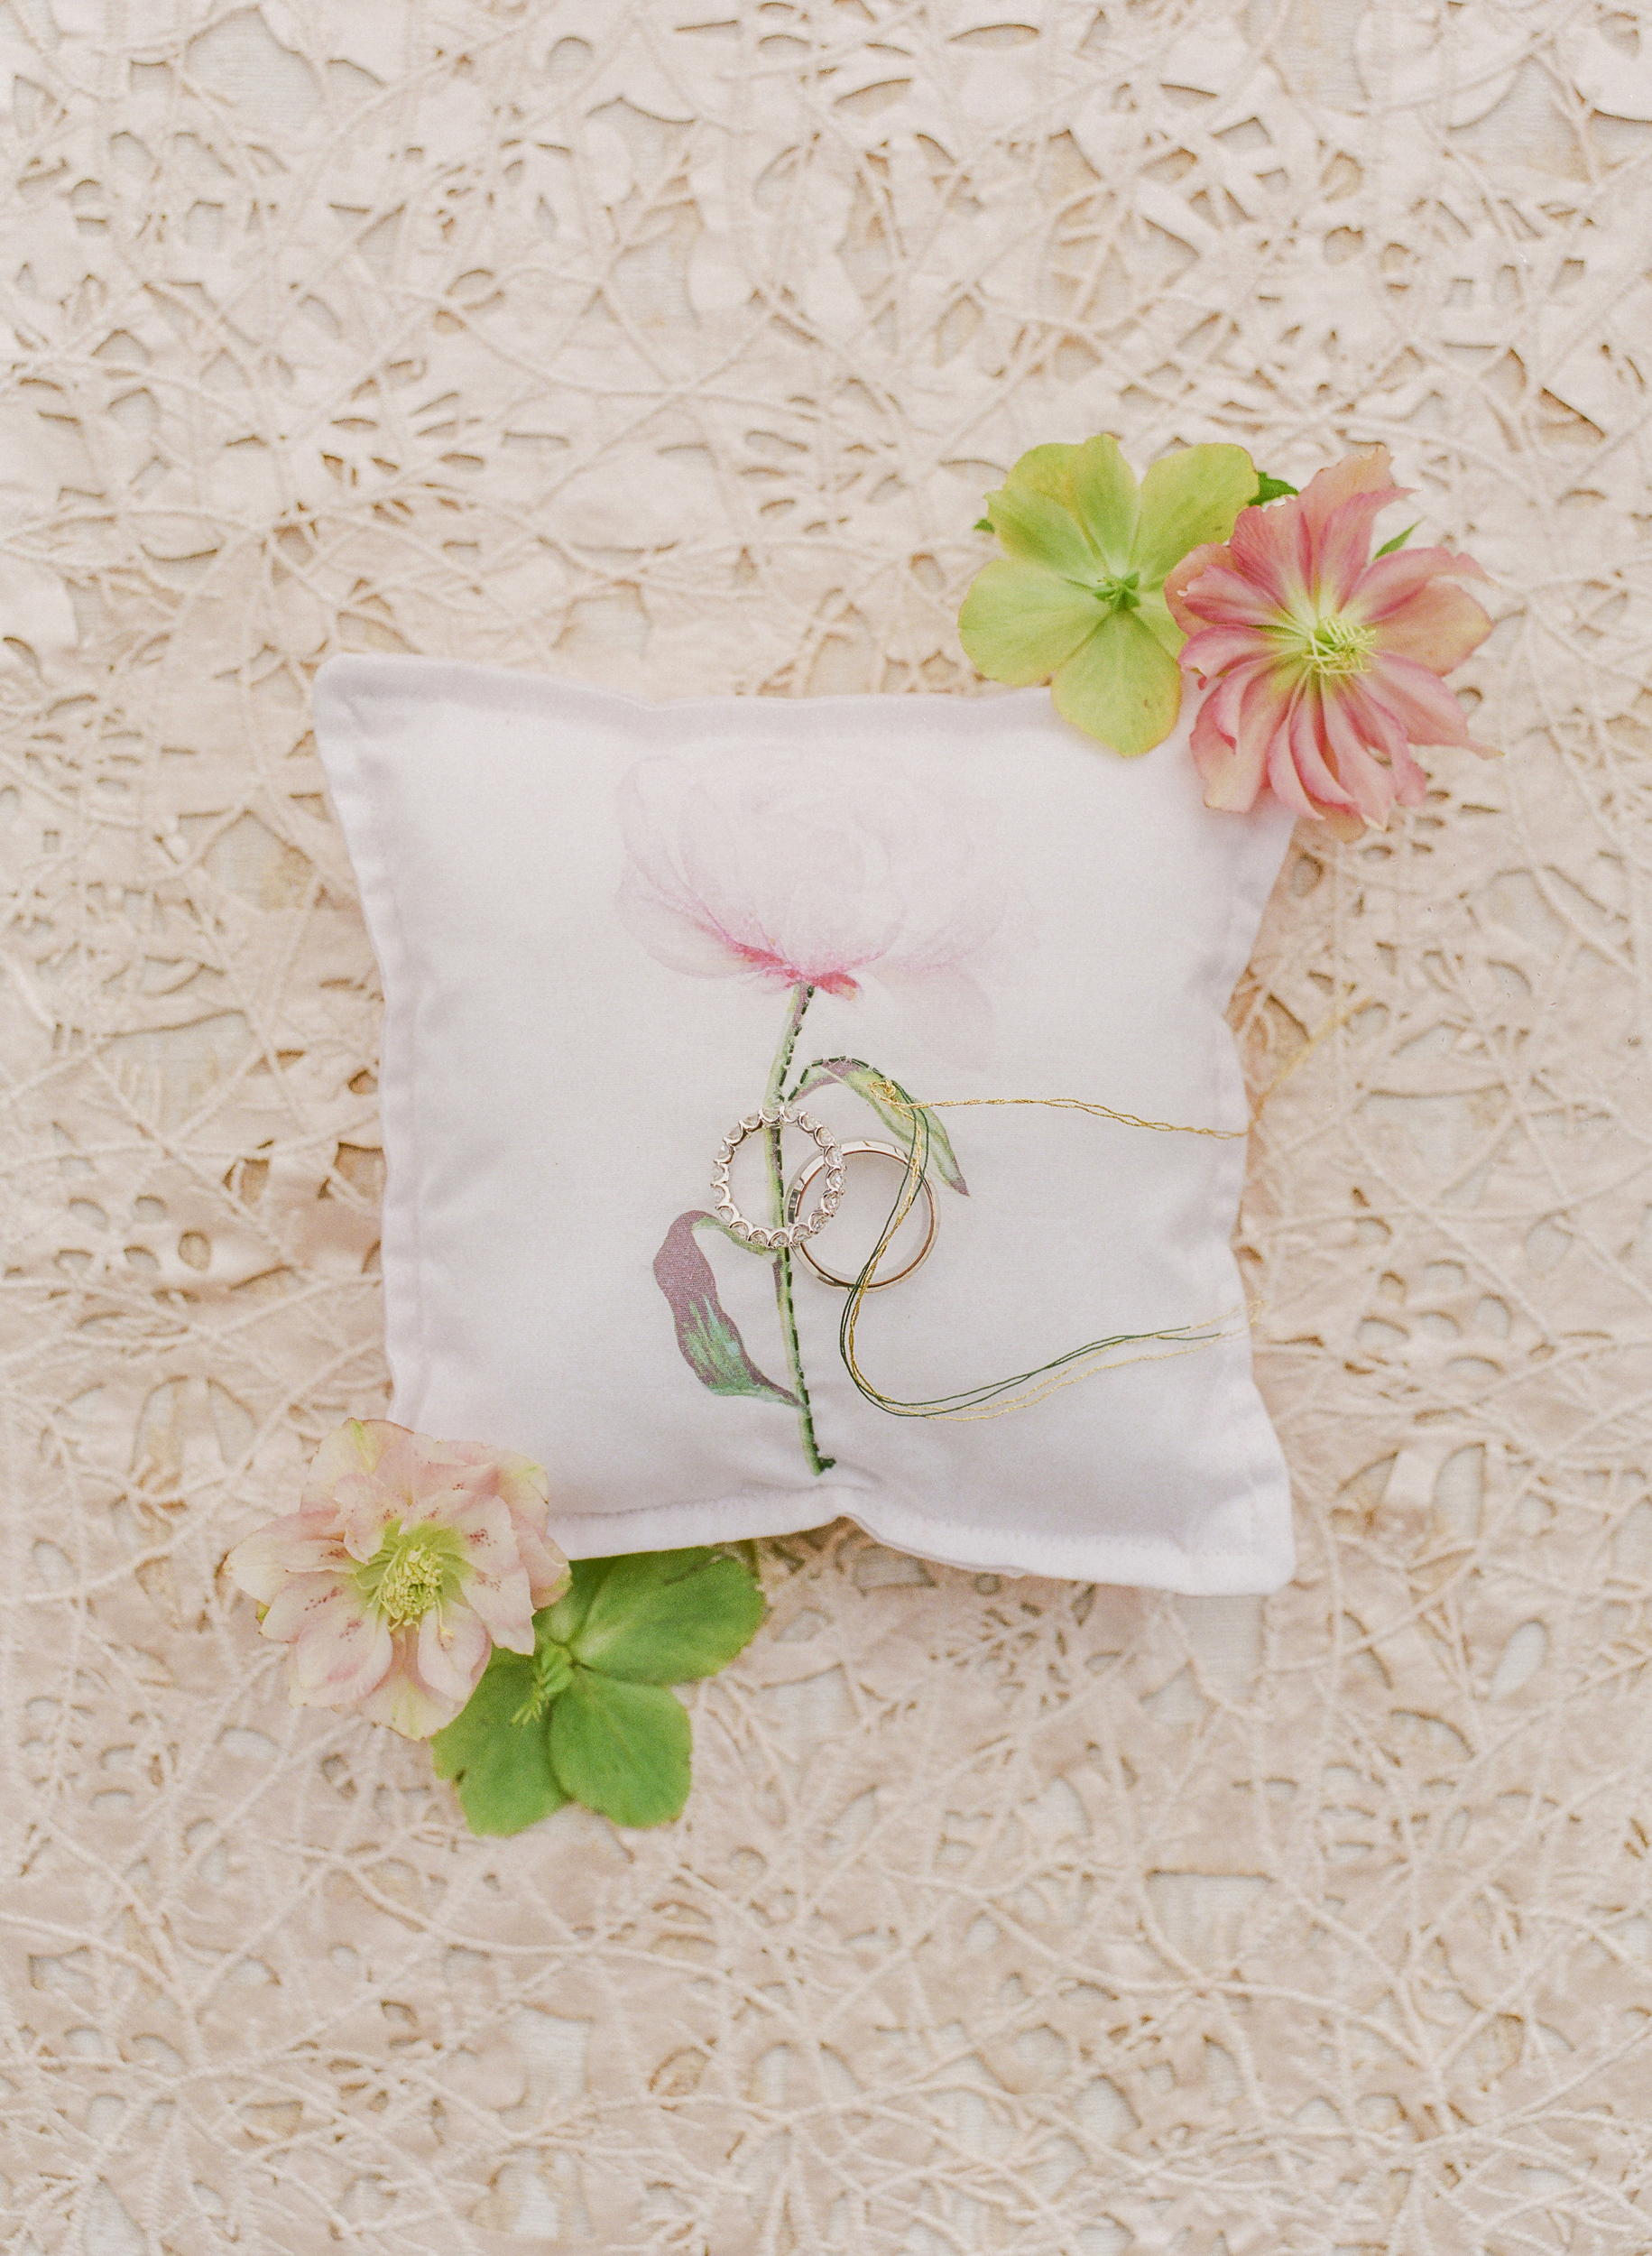 suzanne joseph wedding ring pillow corbin gurkin